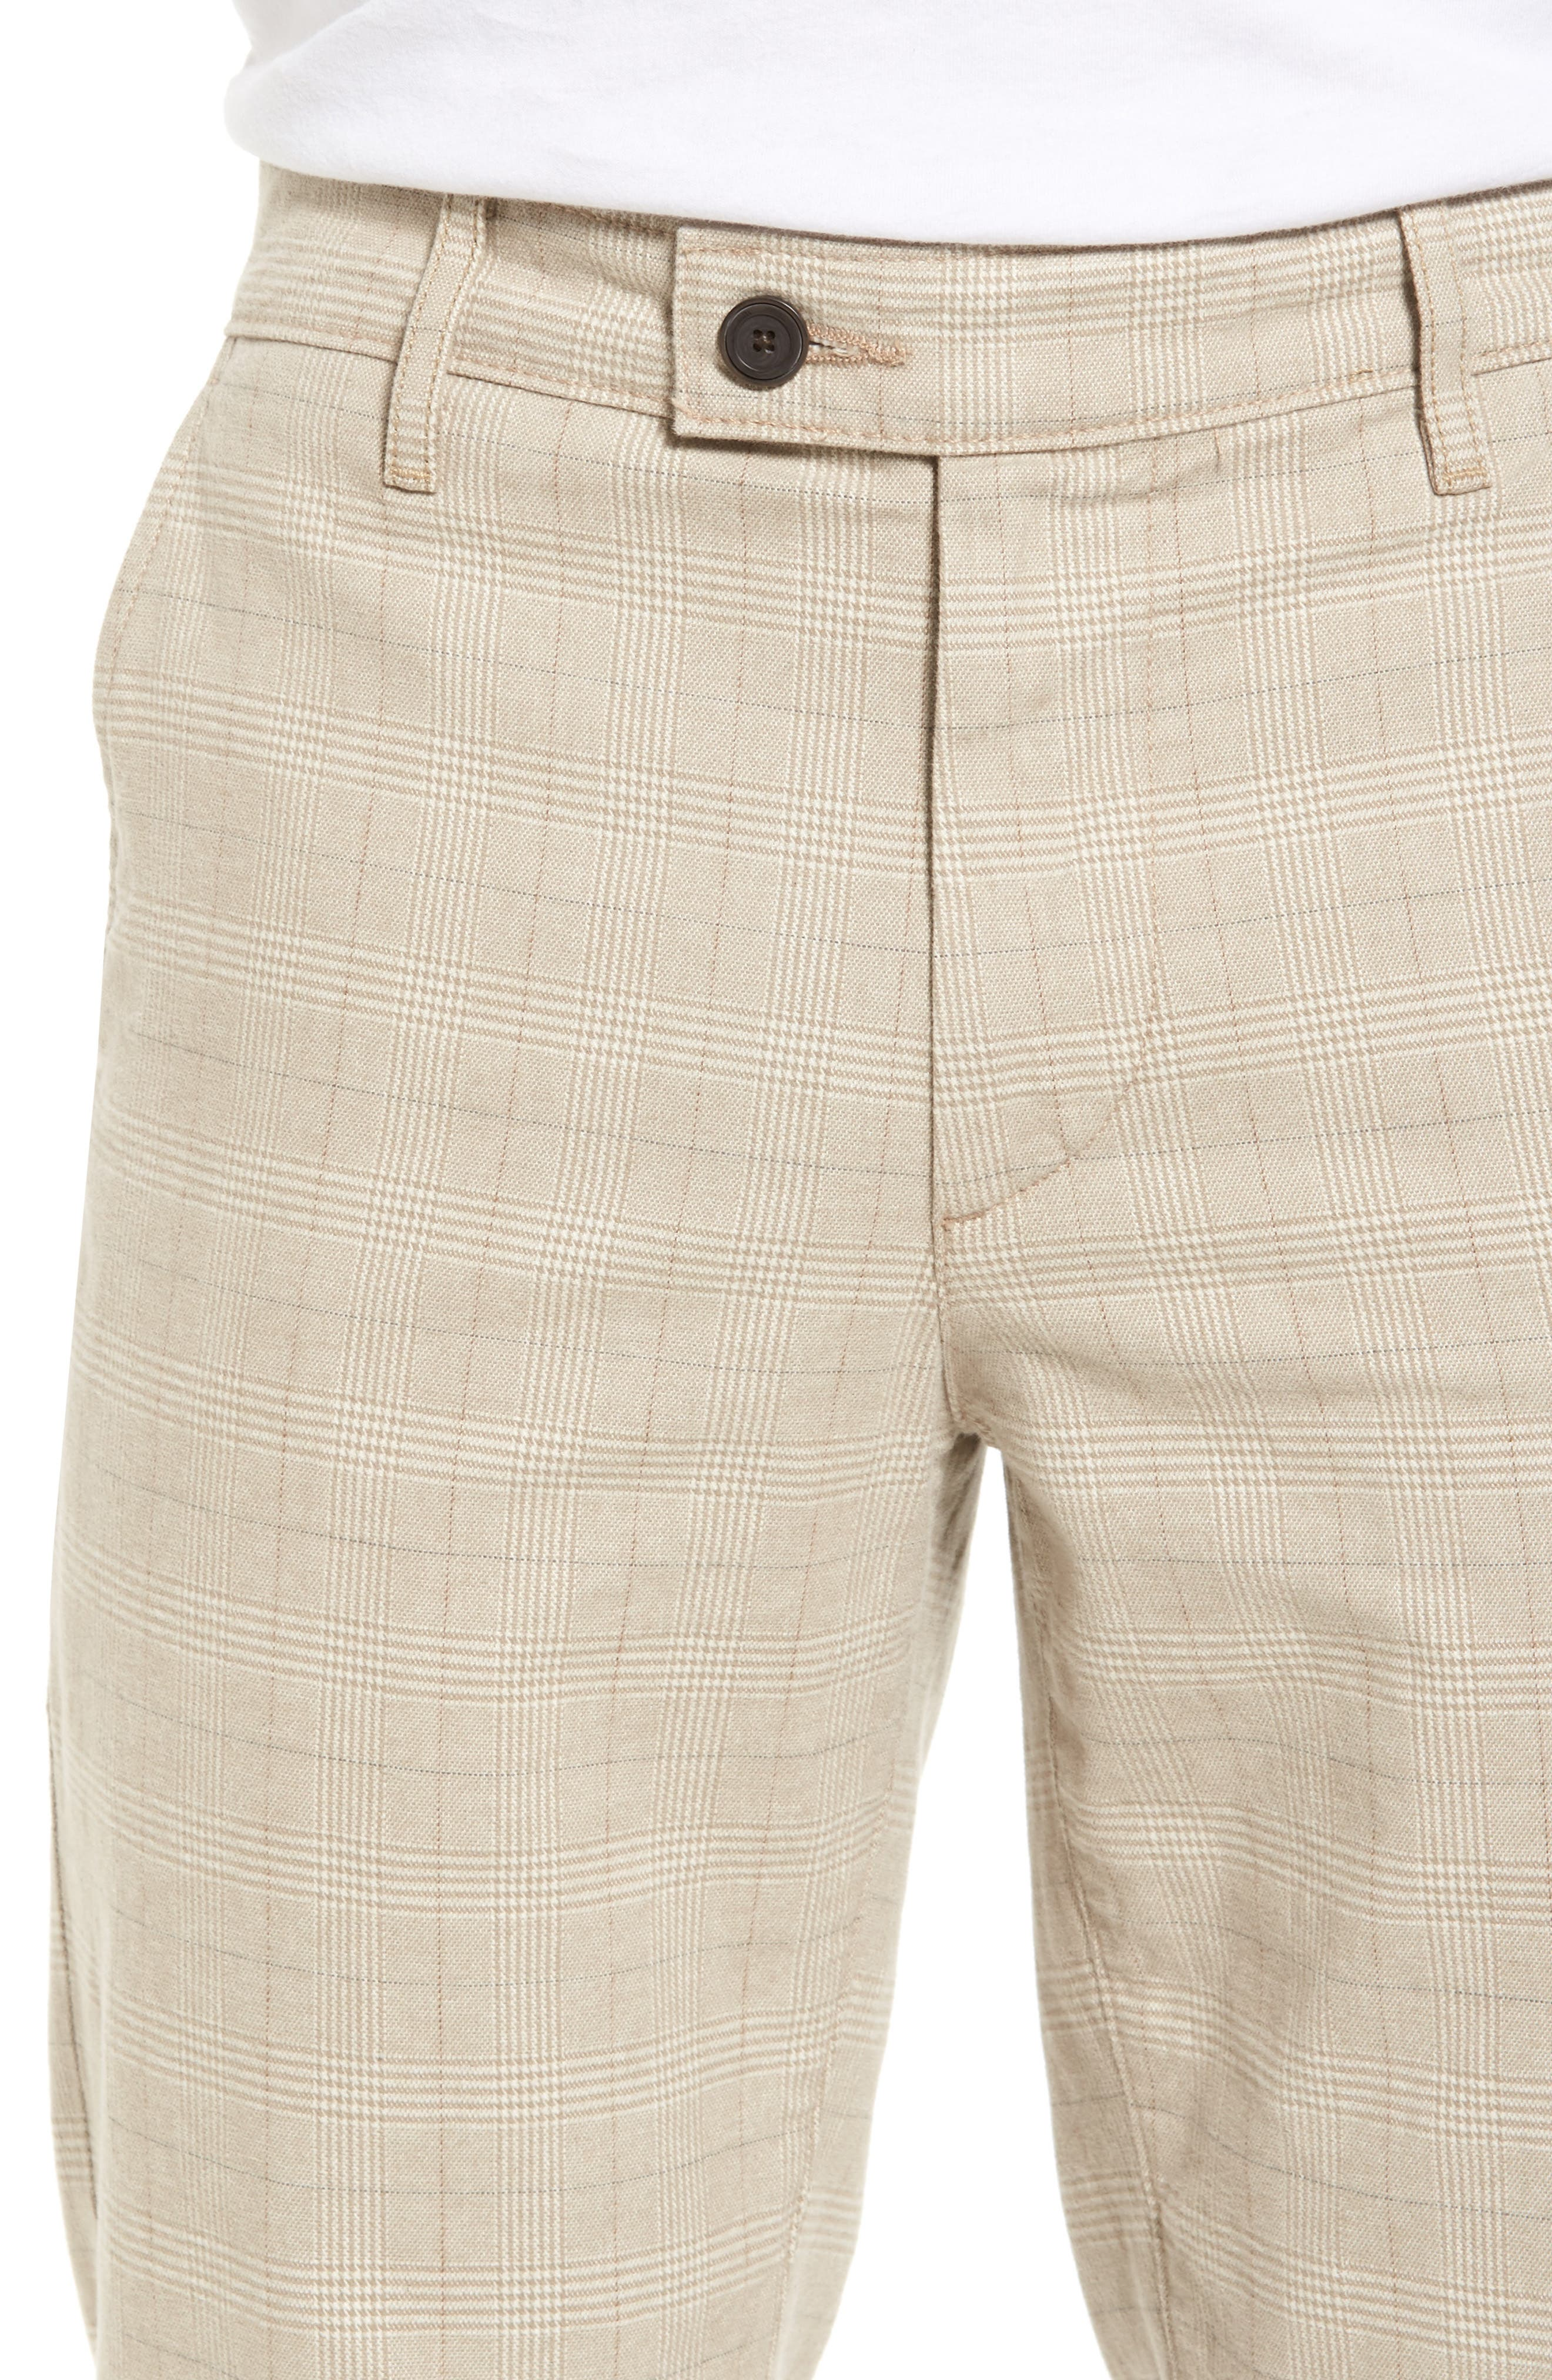 Marshall Slim Fit Pants,                             Alternate thumbnail 4, color,                             Silica Sand